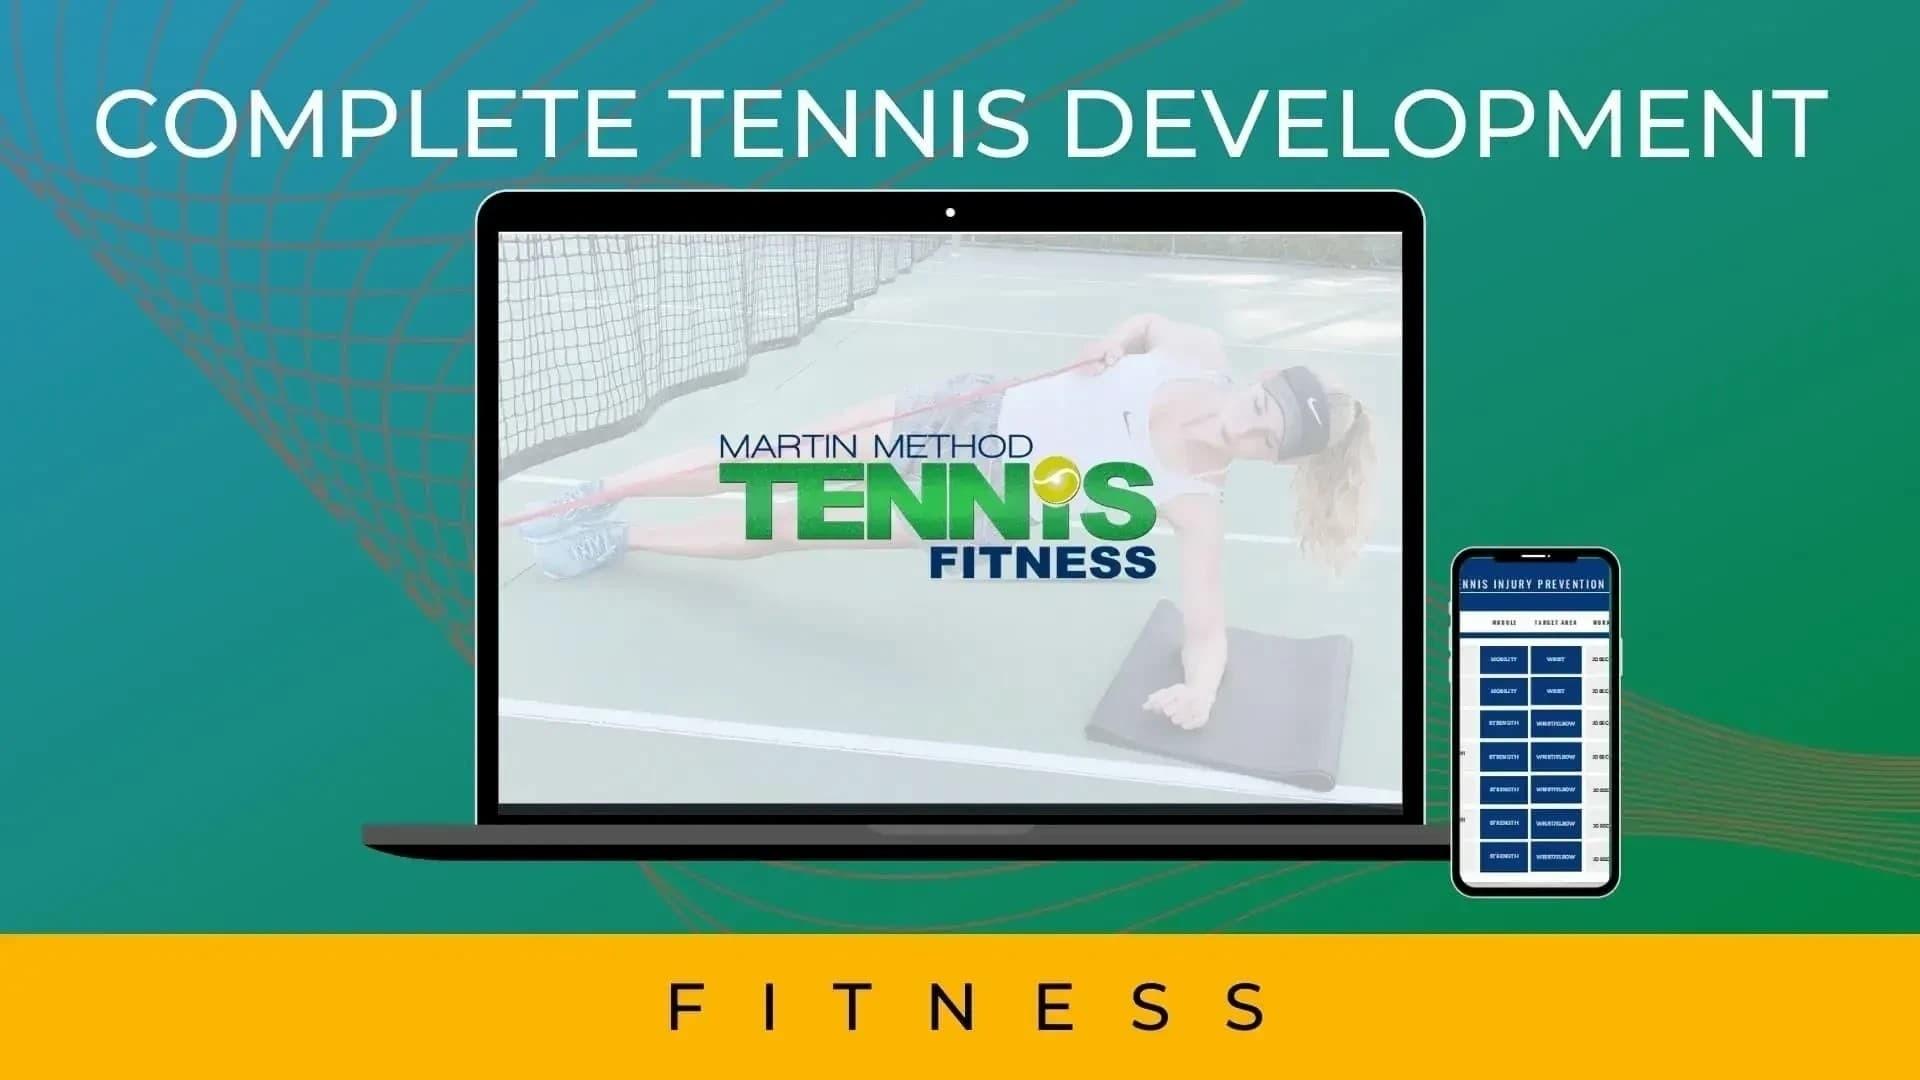 fitness-injury-prevention-2